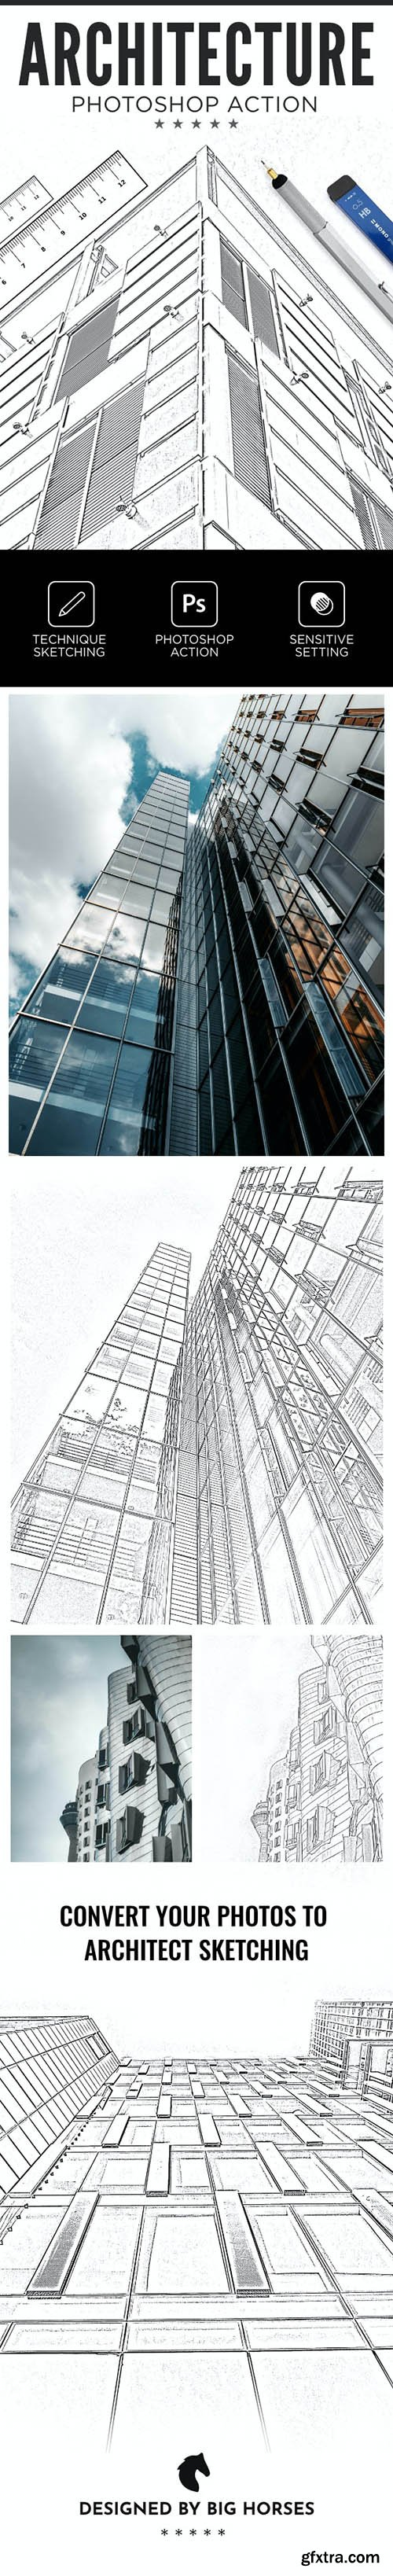 GraphicRiver - Architecture Photoshop Action 26533251